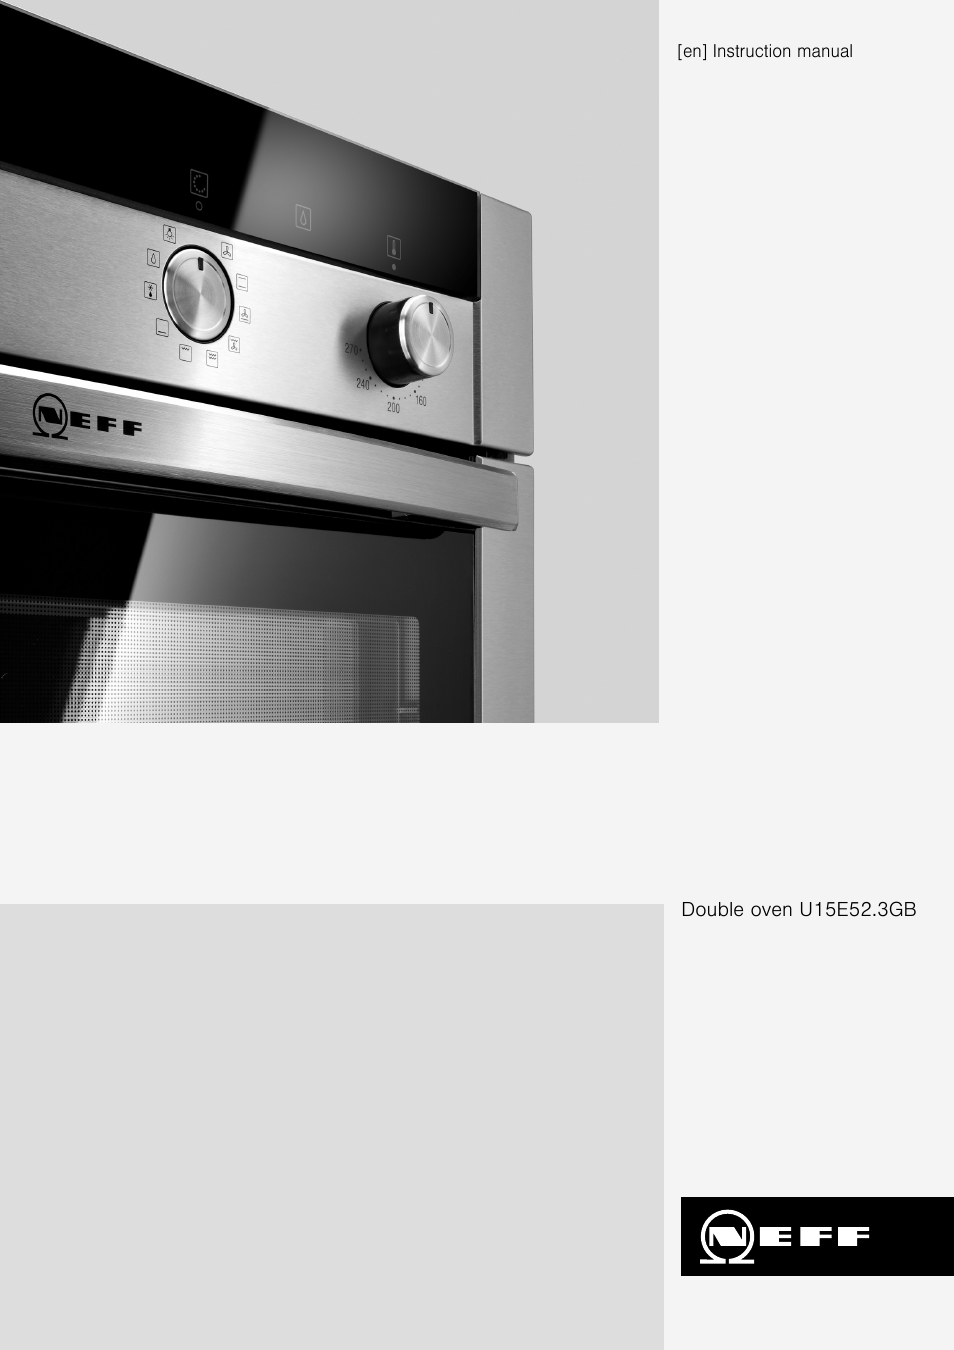 neff u15e52n3gb user manual 32 pages also for u15e52s3gb rh manualsdir com neff double oven specifications neff double oven u14m42n5gb instruction manual